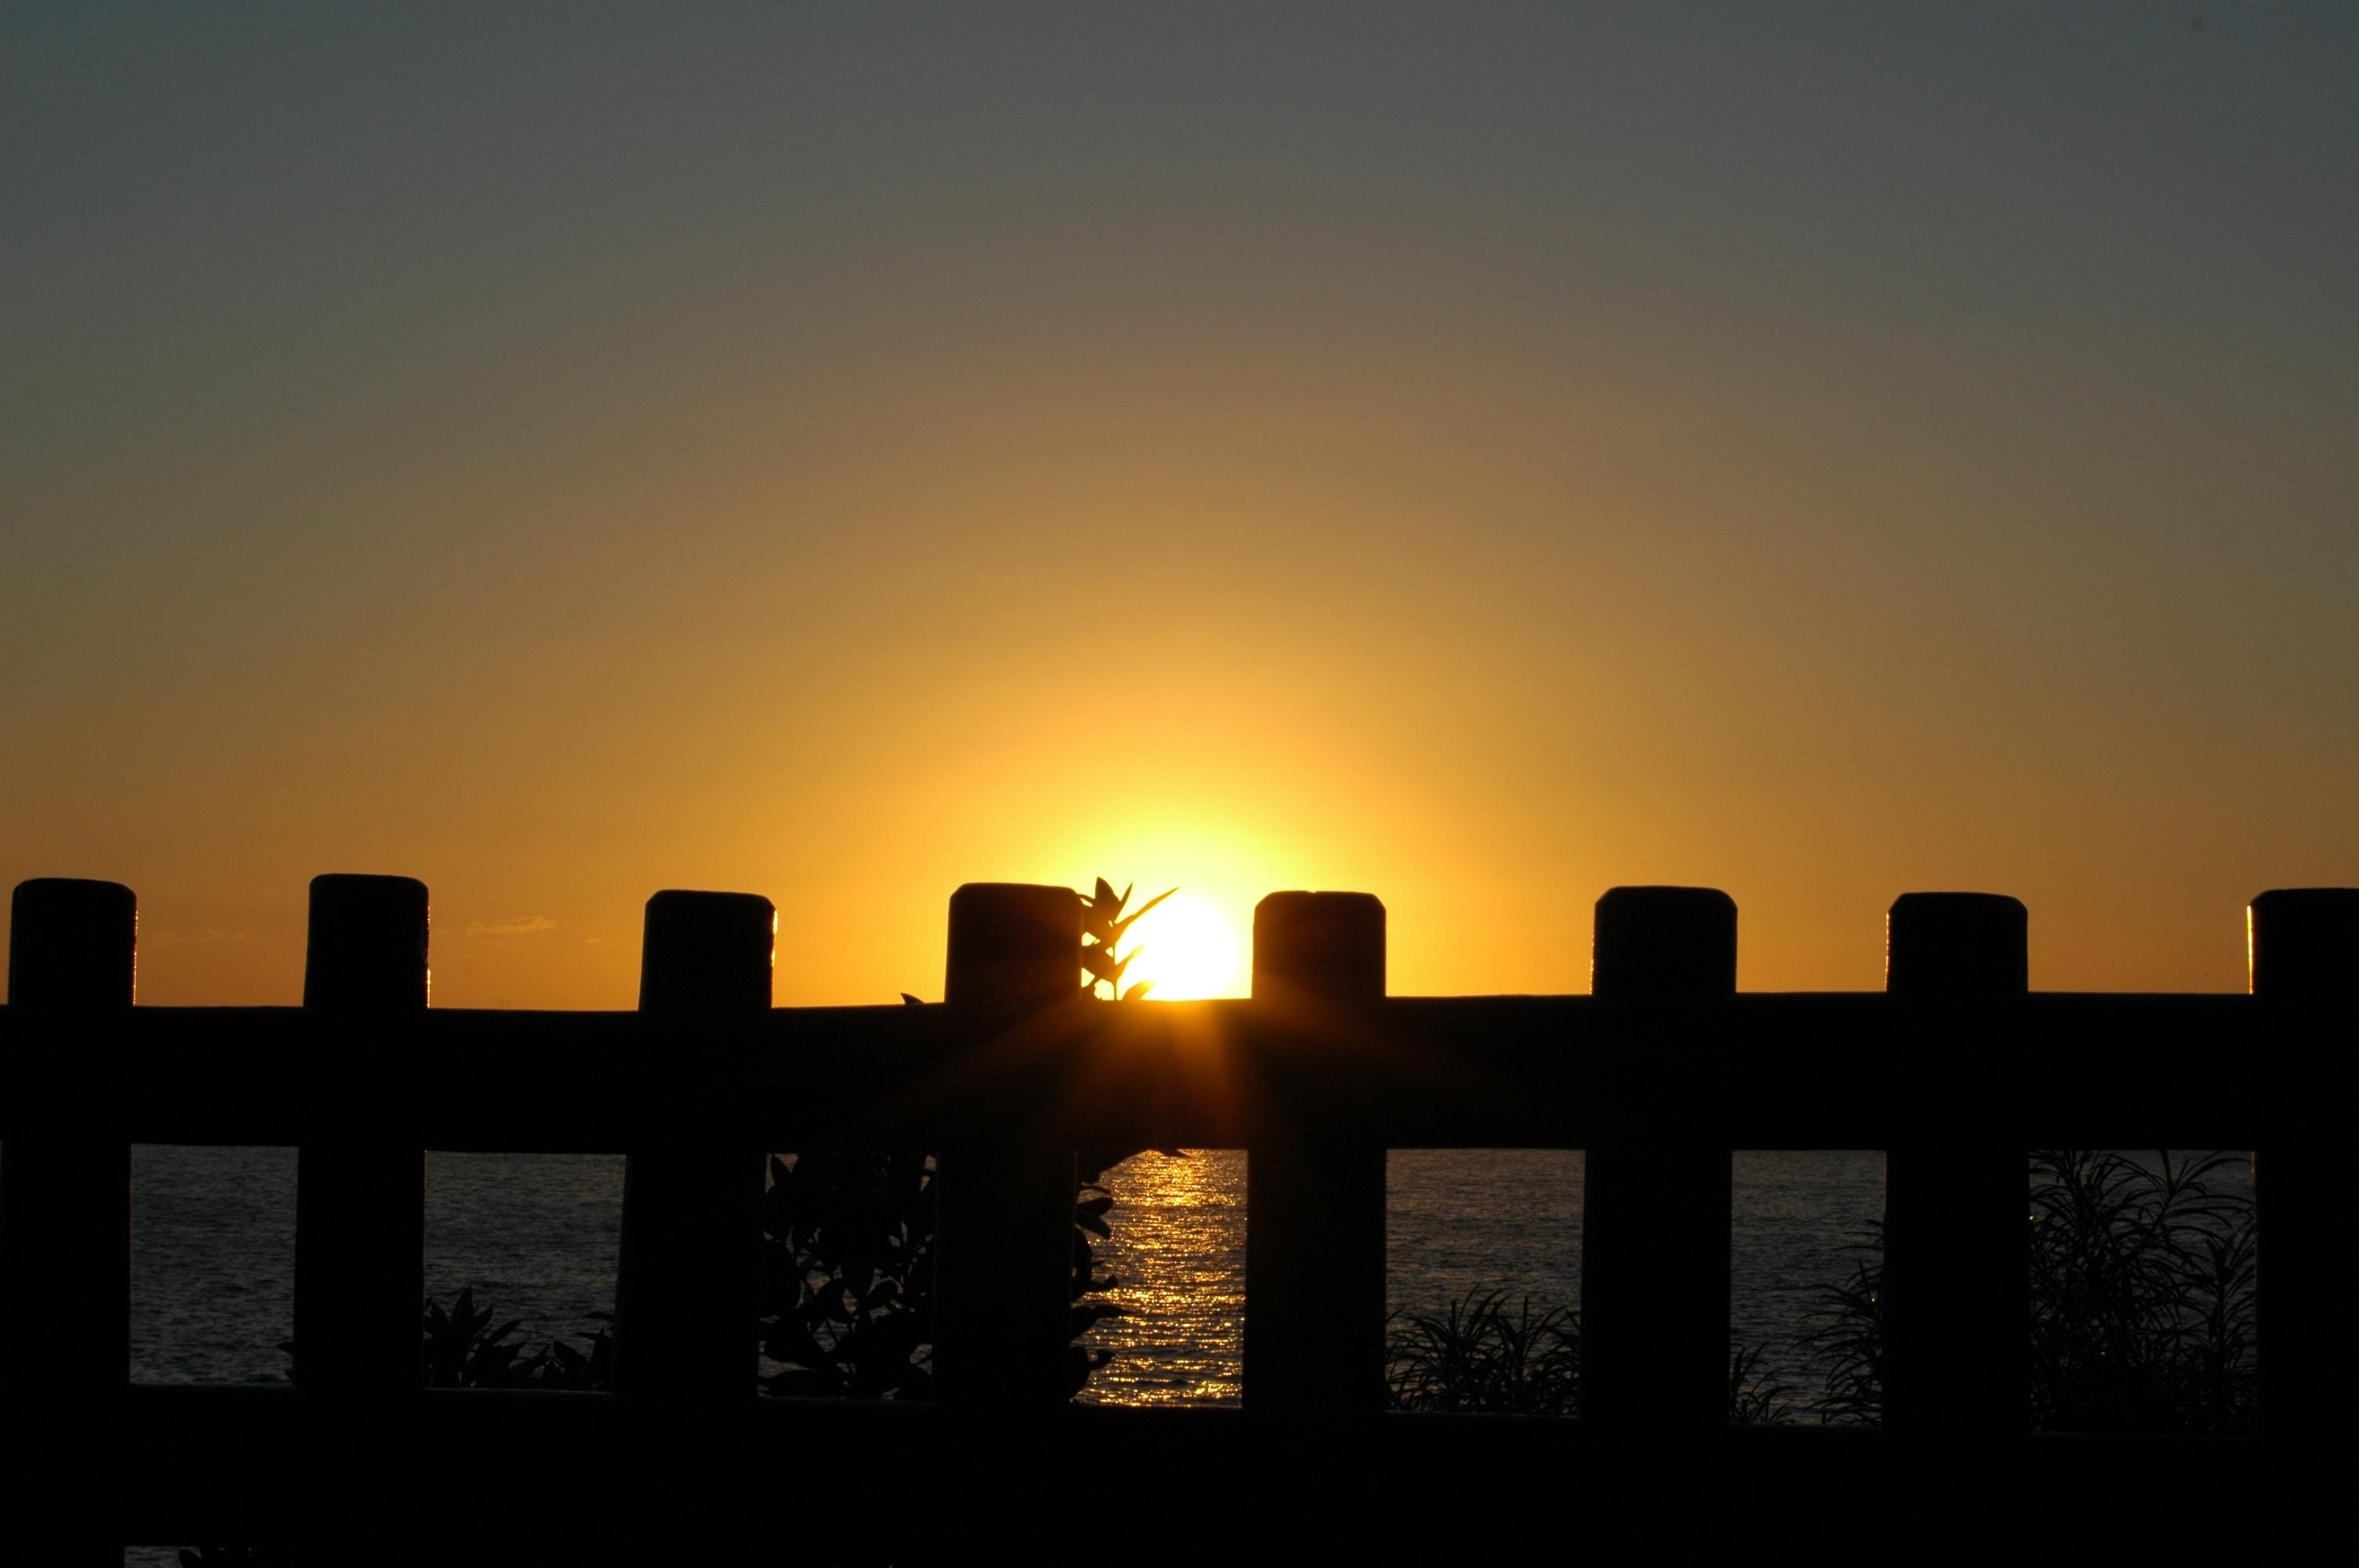 Gate blocking ocean and sunset